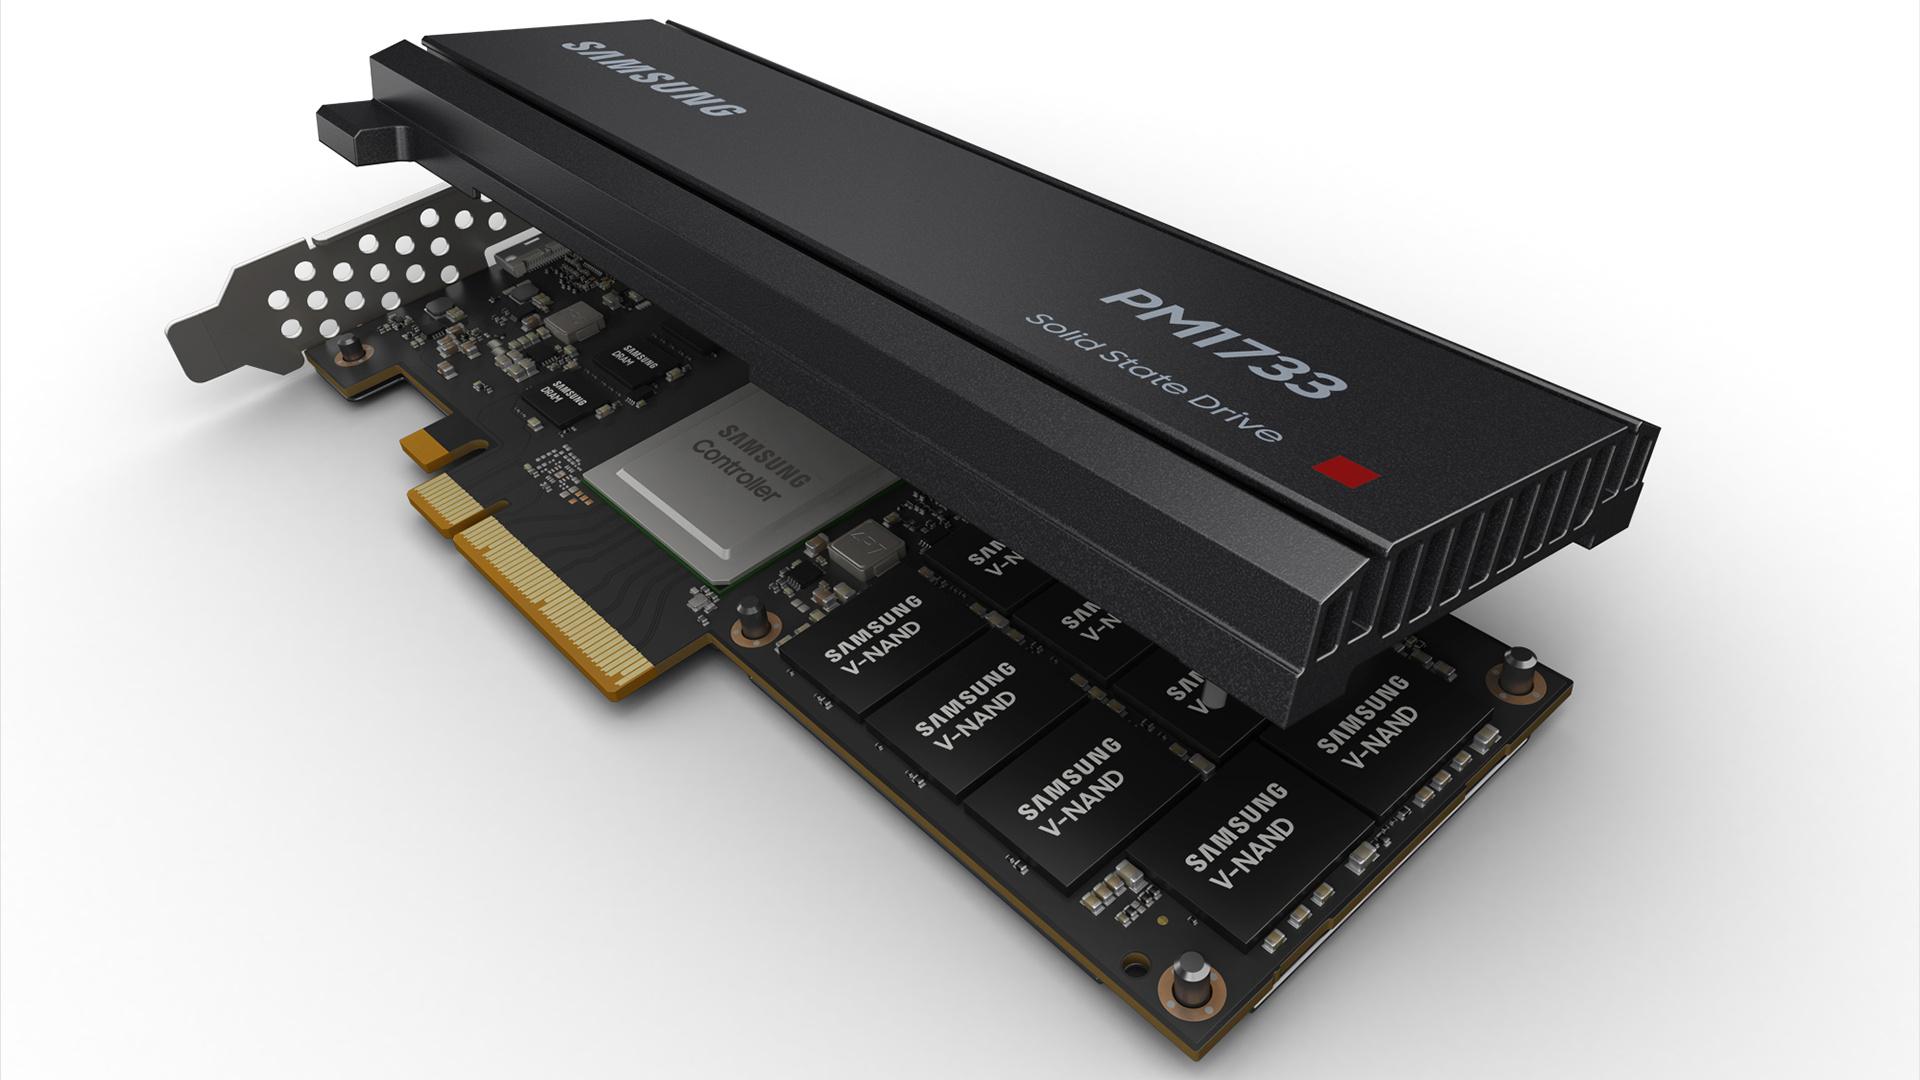 Samsung PM1733 im HHHL-Format